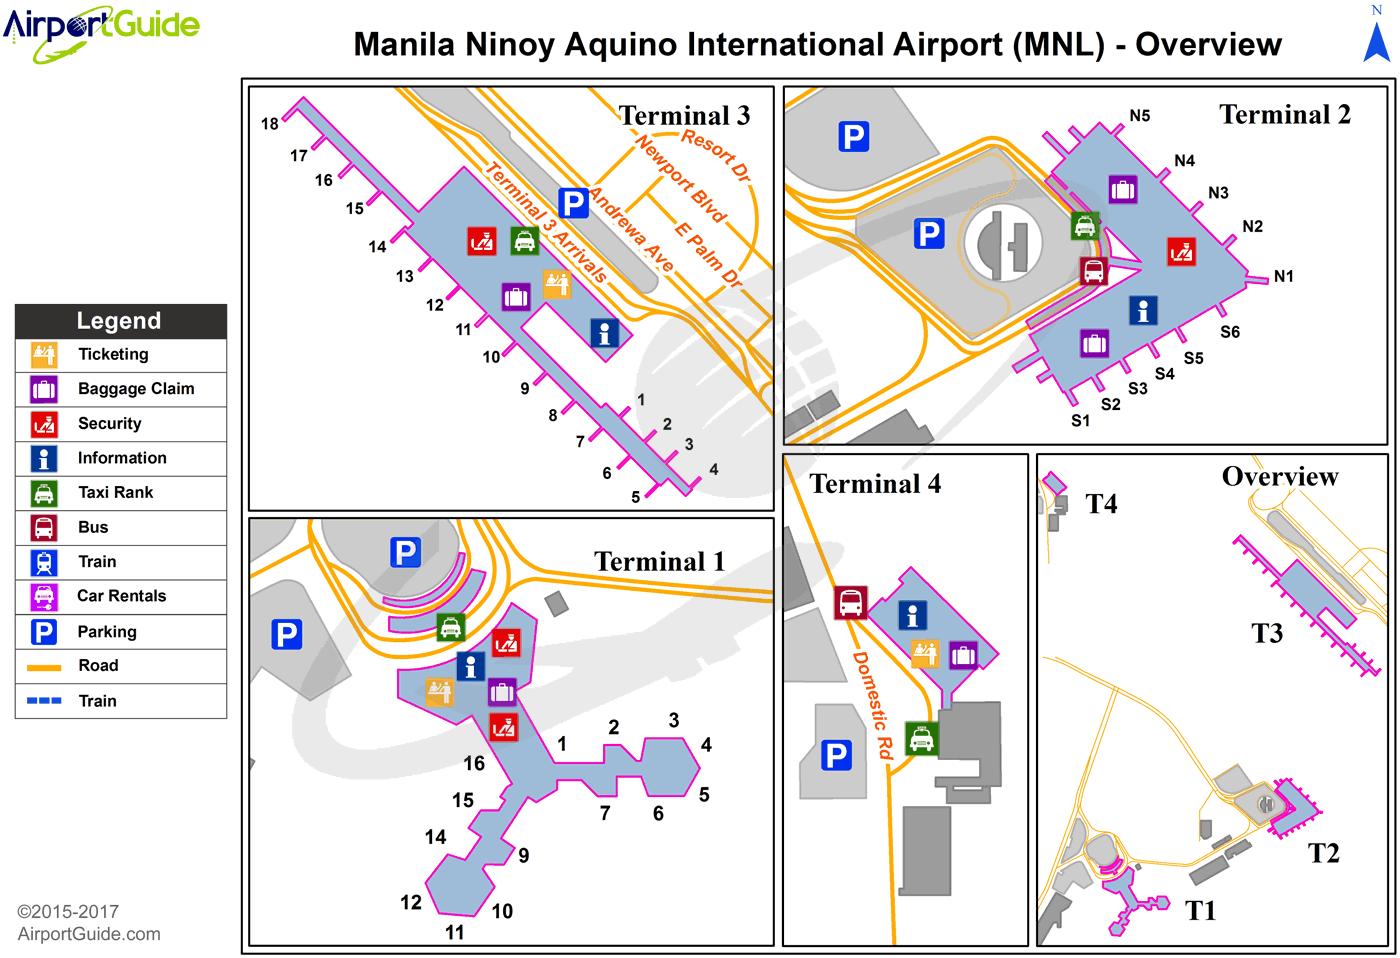 ninoy aquino international airport terminal 1 map Manila Ninoy Aquino International Mnl Airport Terminal Map ninoy aquino international airport terminal 1 map